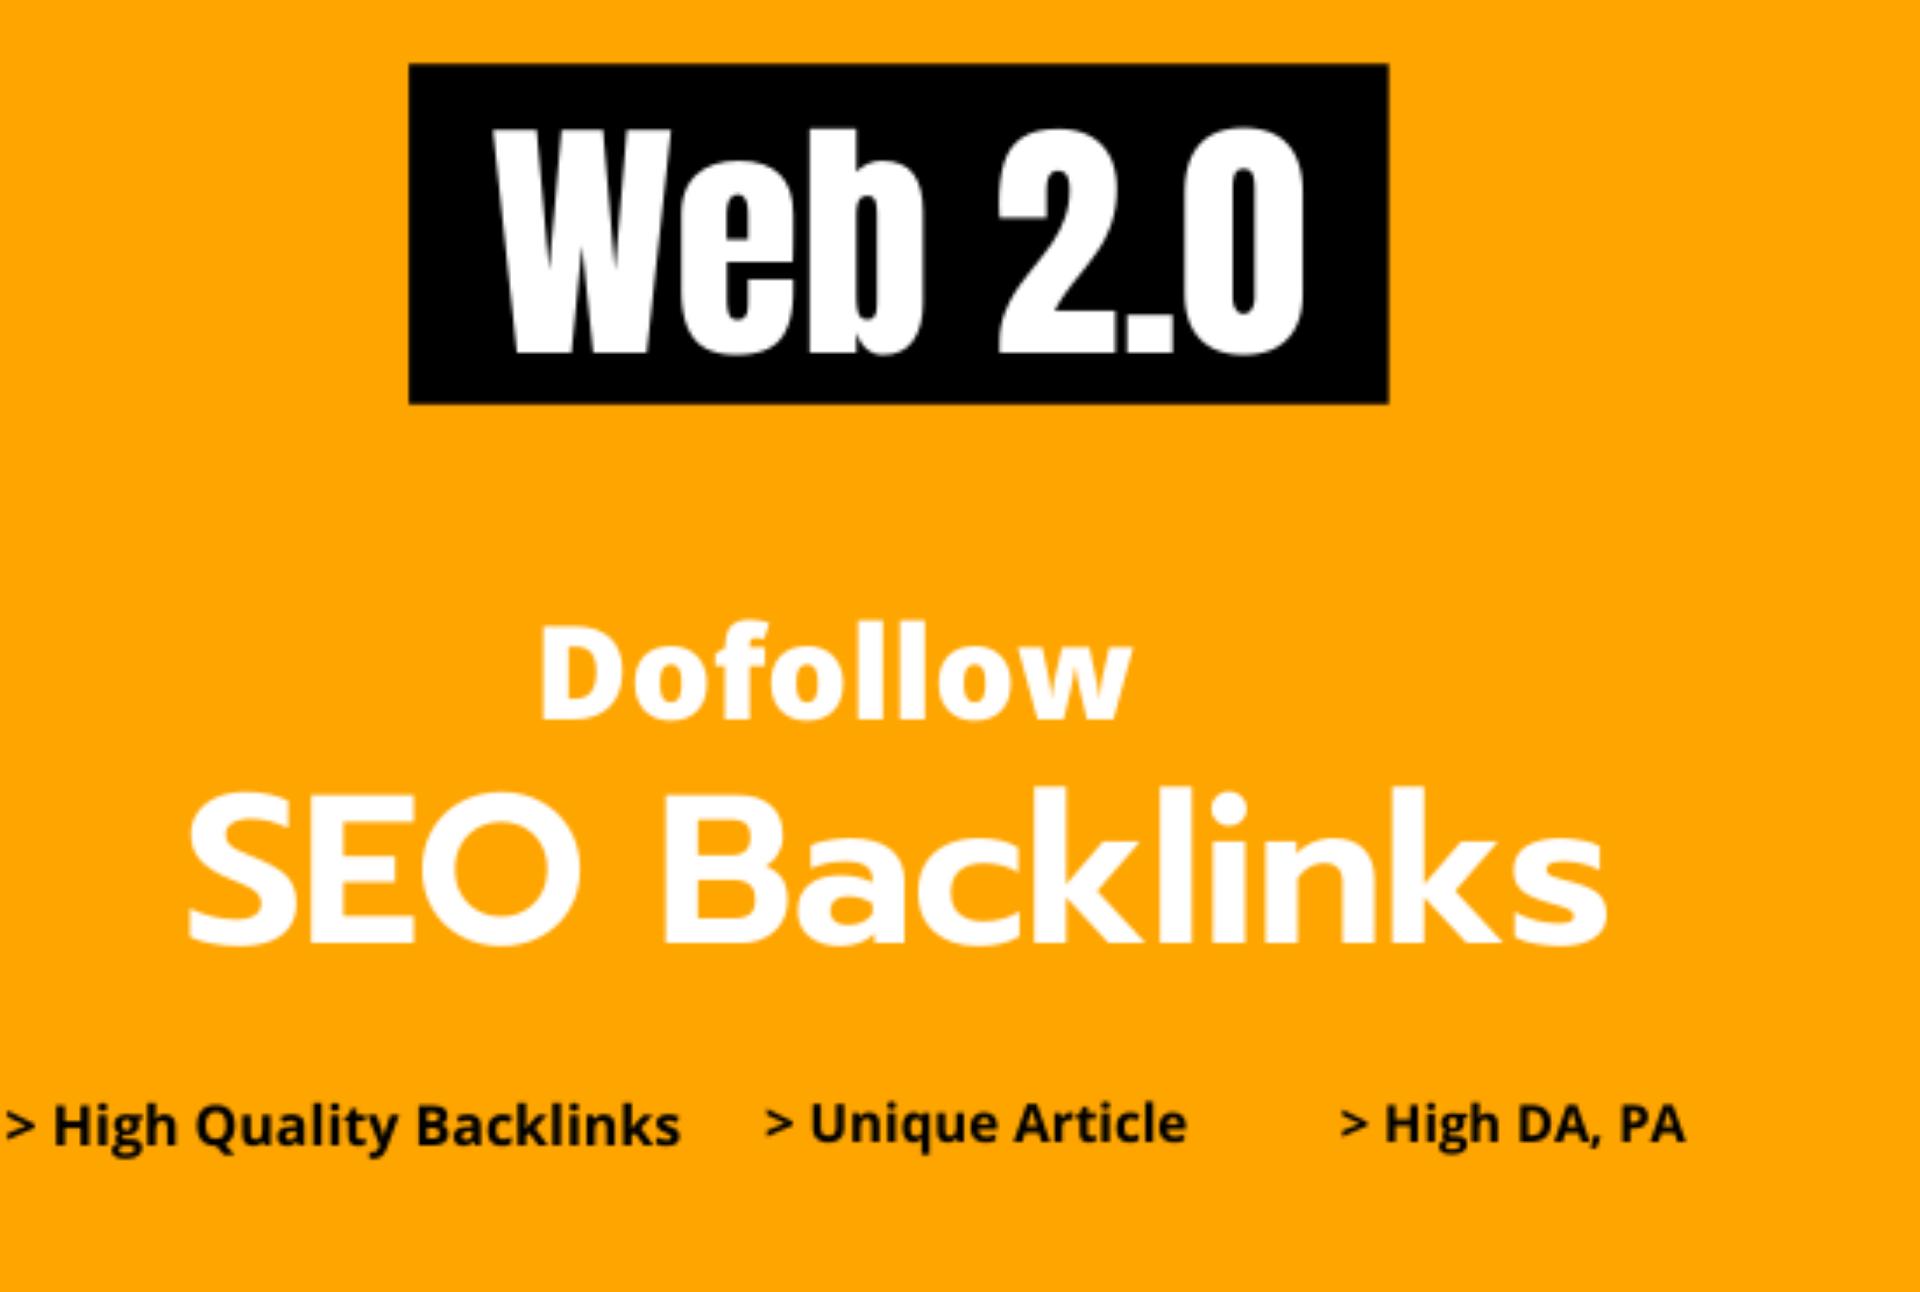 100 High Authority Web 2.0 PBN Dofollow Backlinks